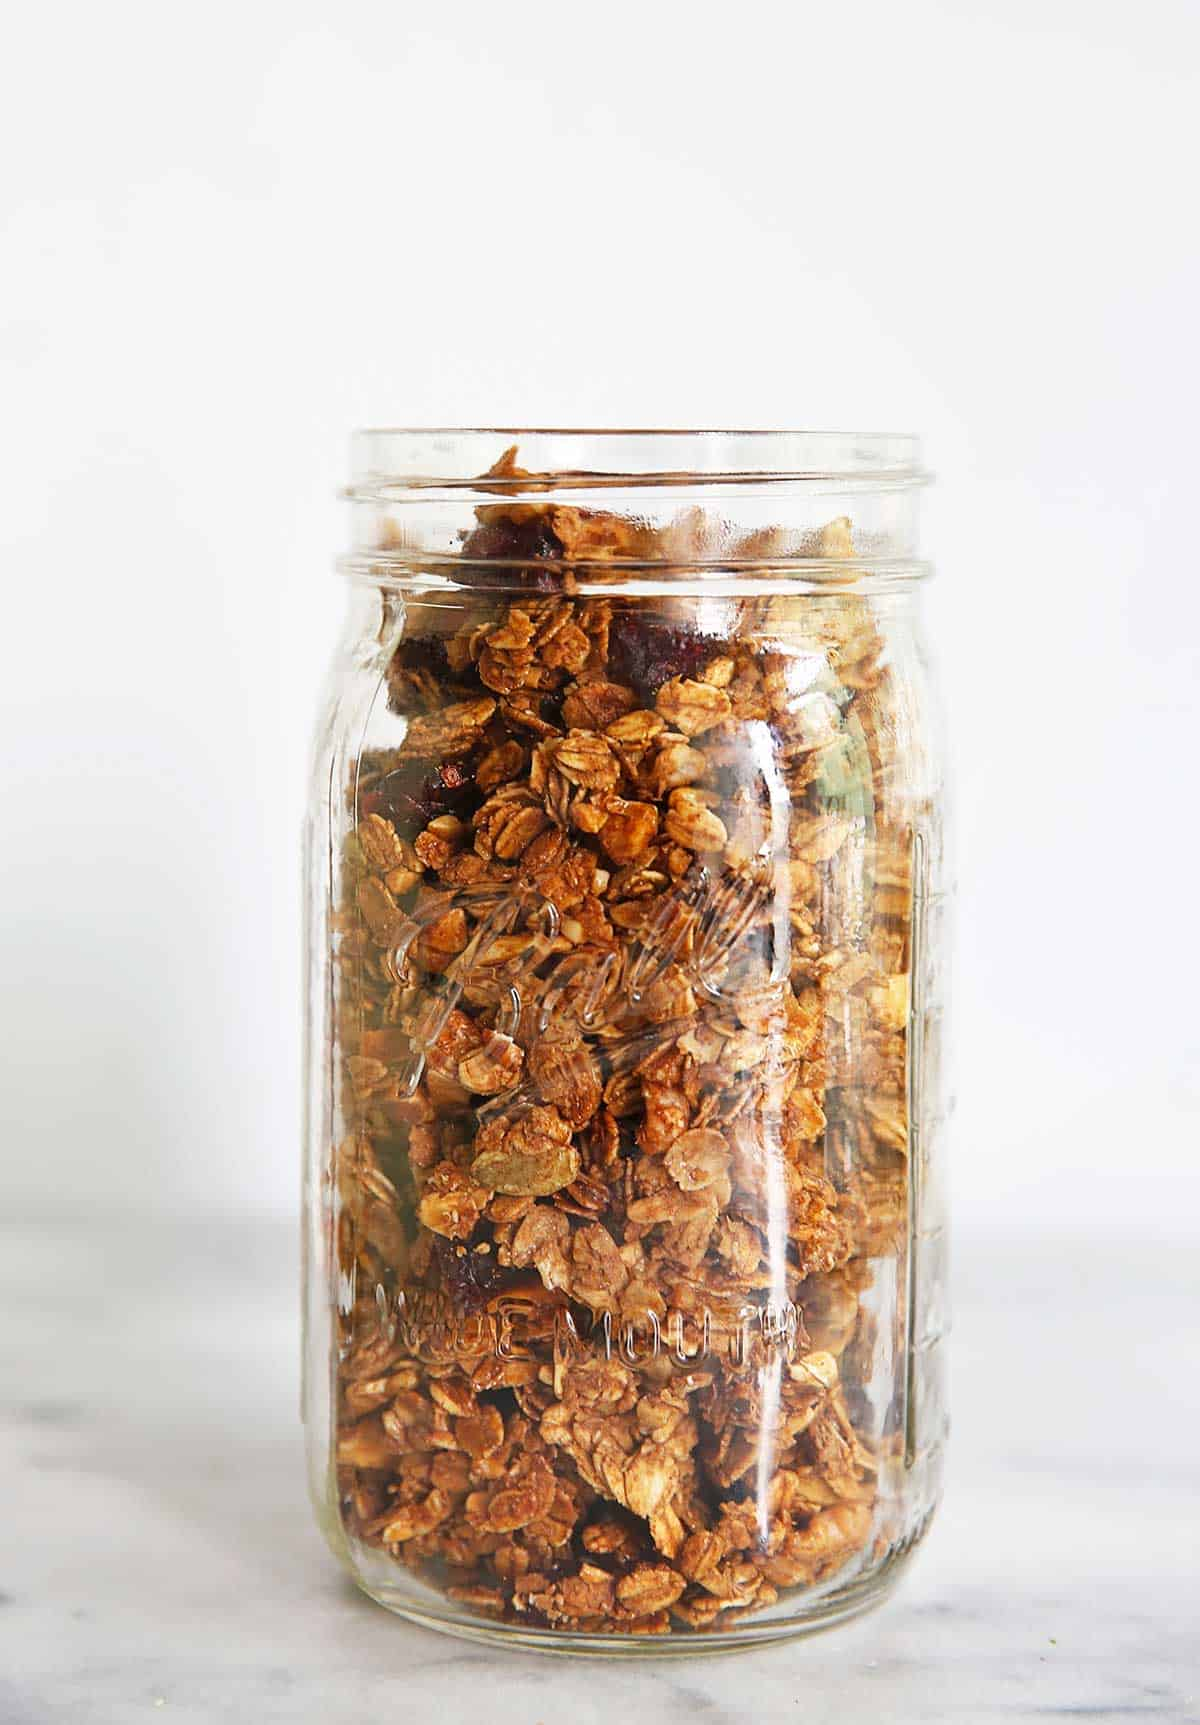 Homemade gluten free granola in jar